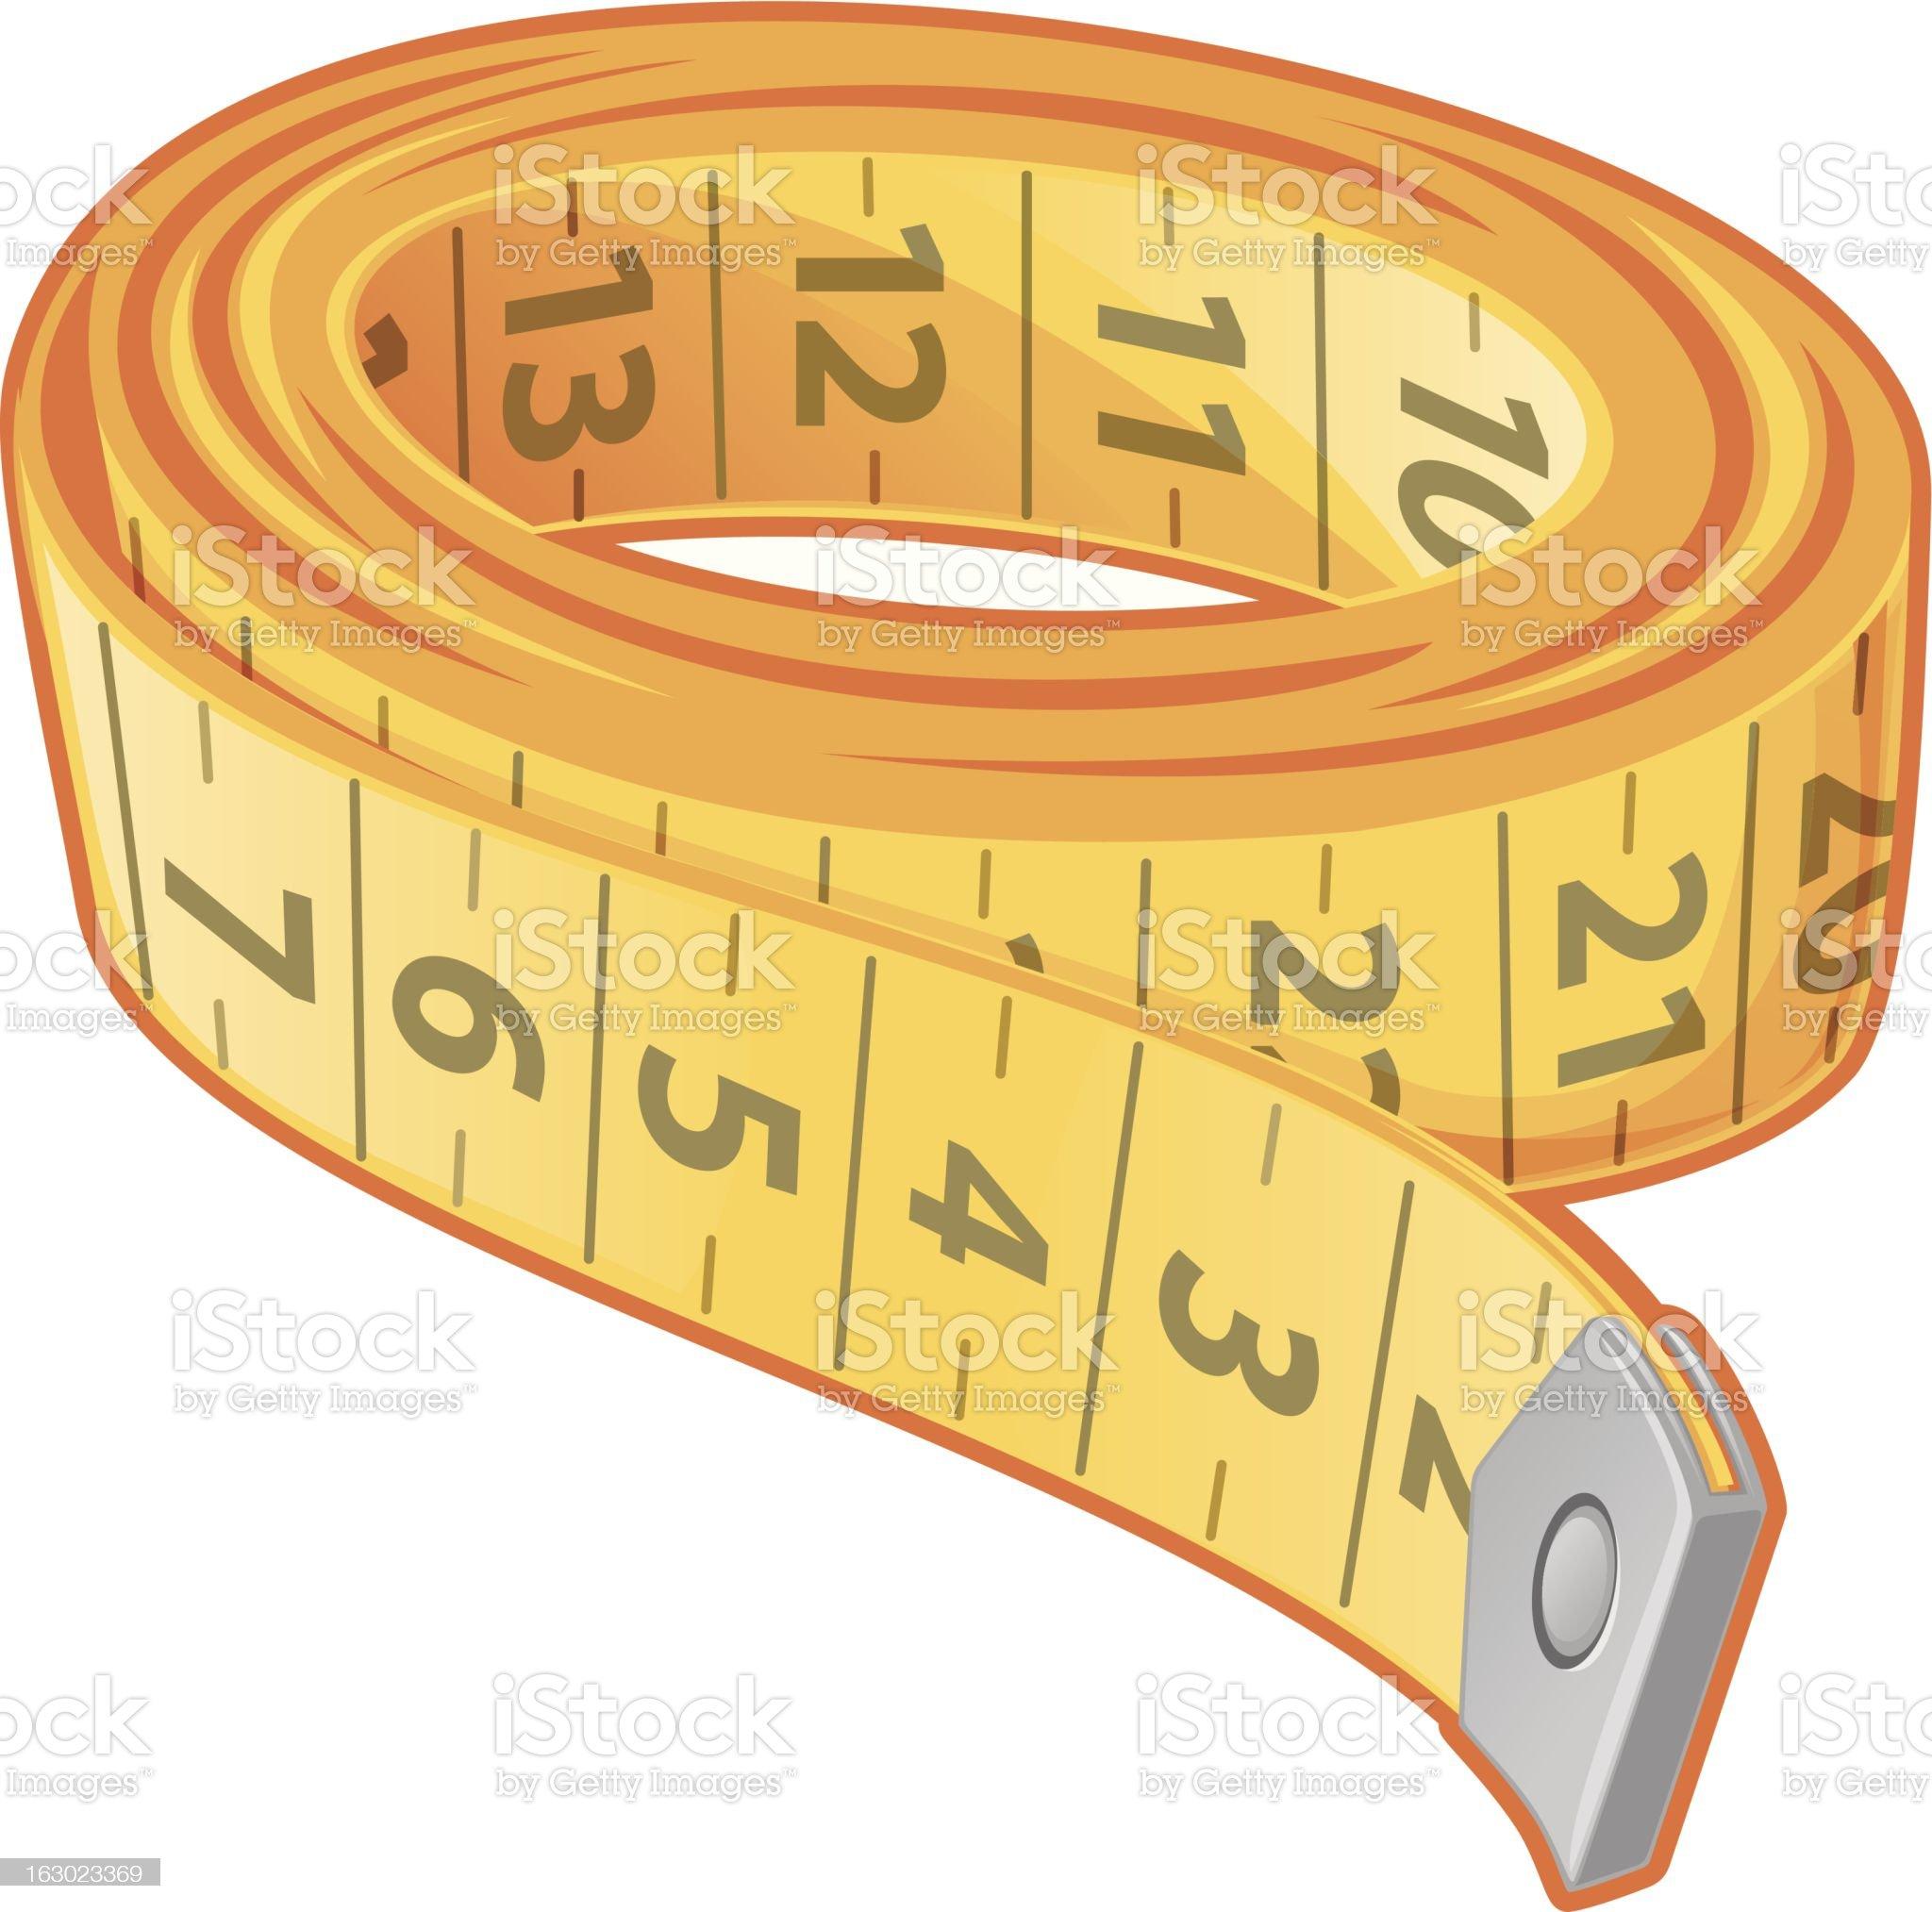 Measuring Tape royalty-free stock vector art